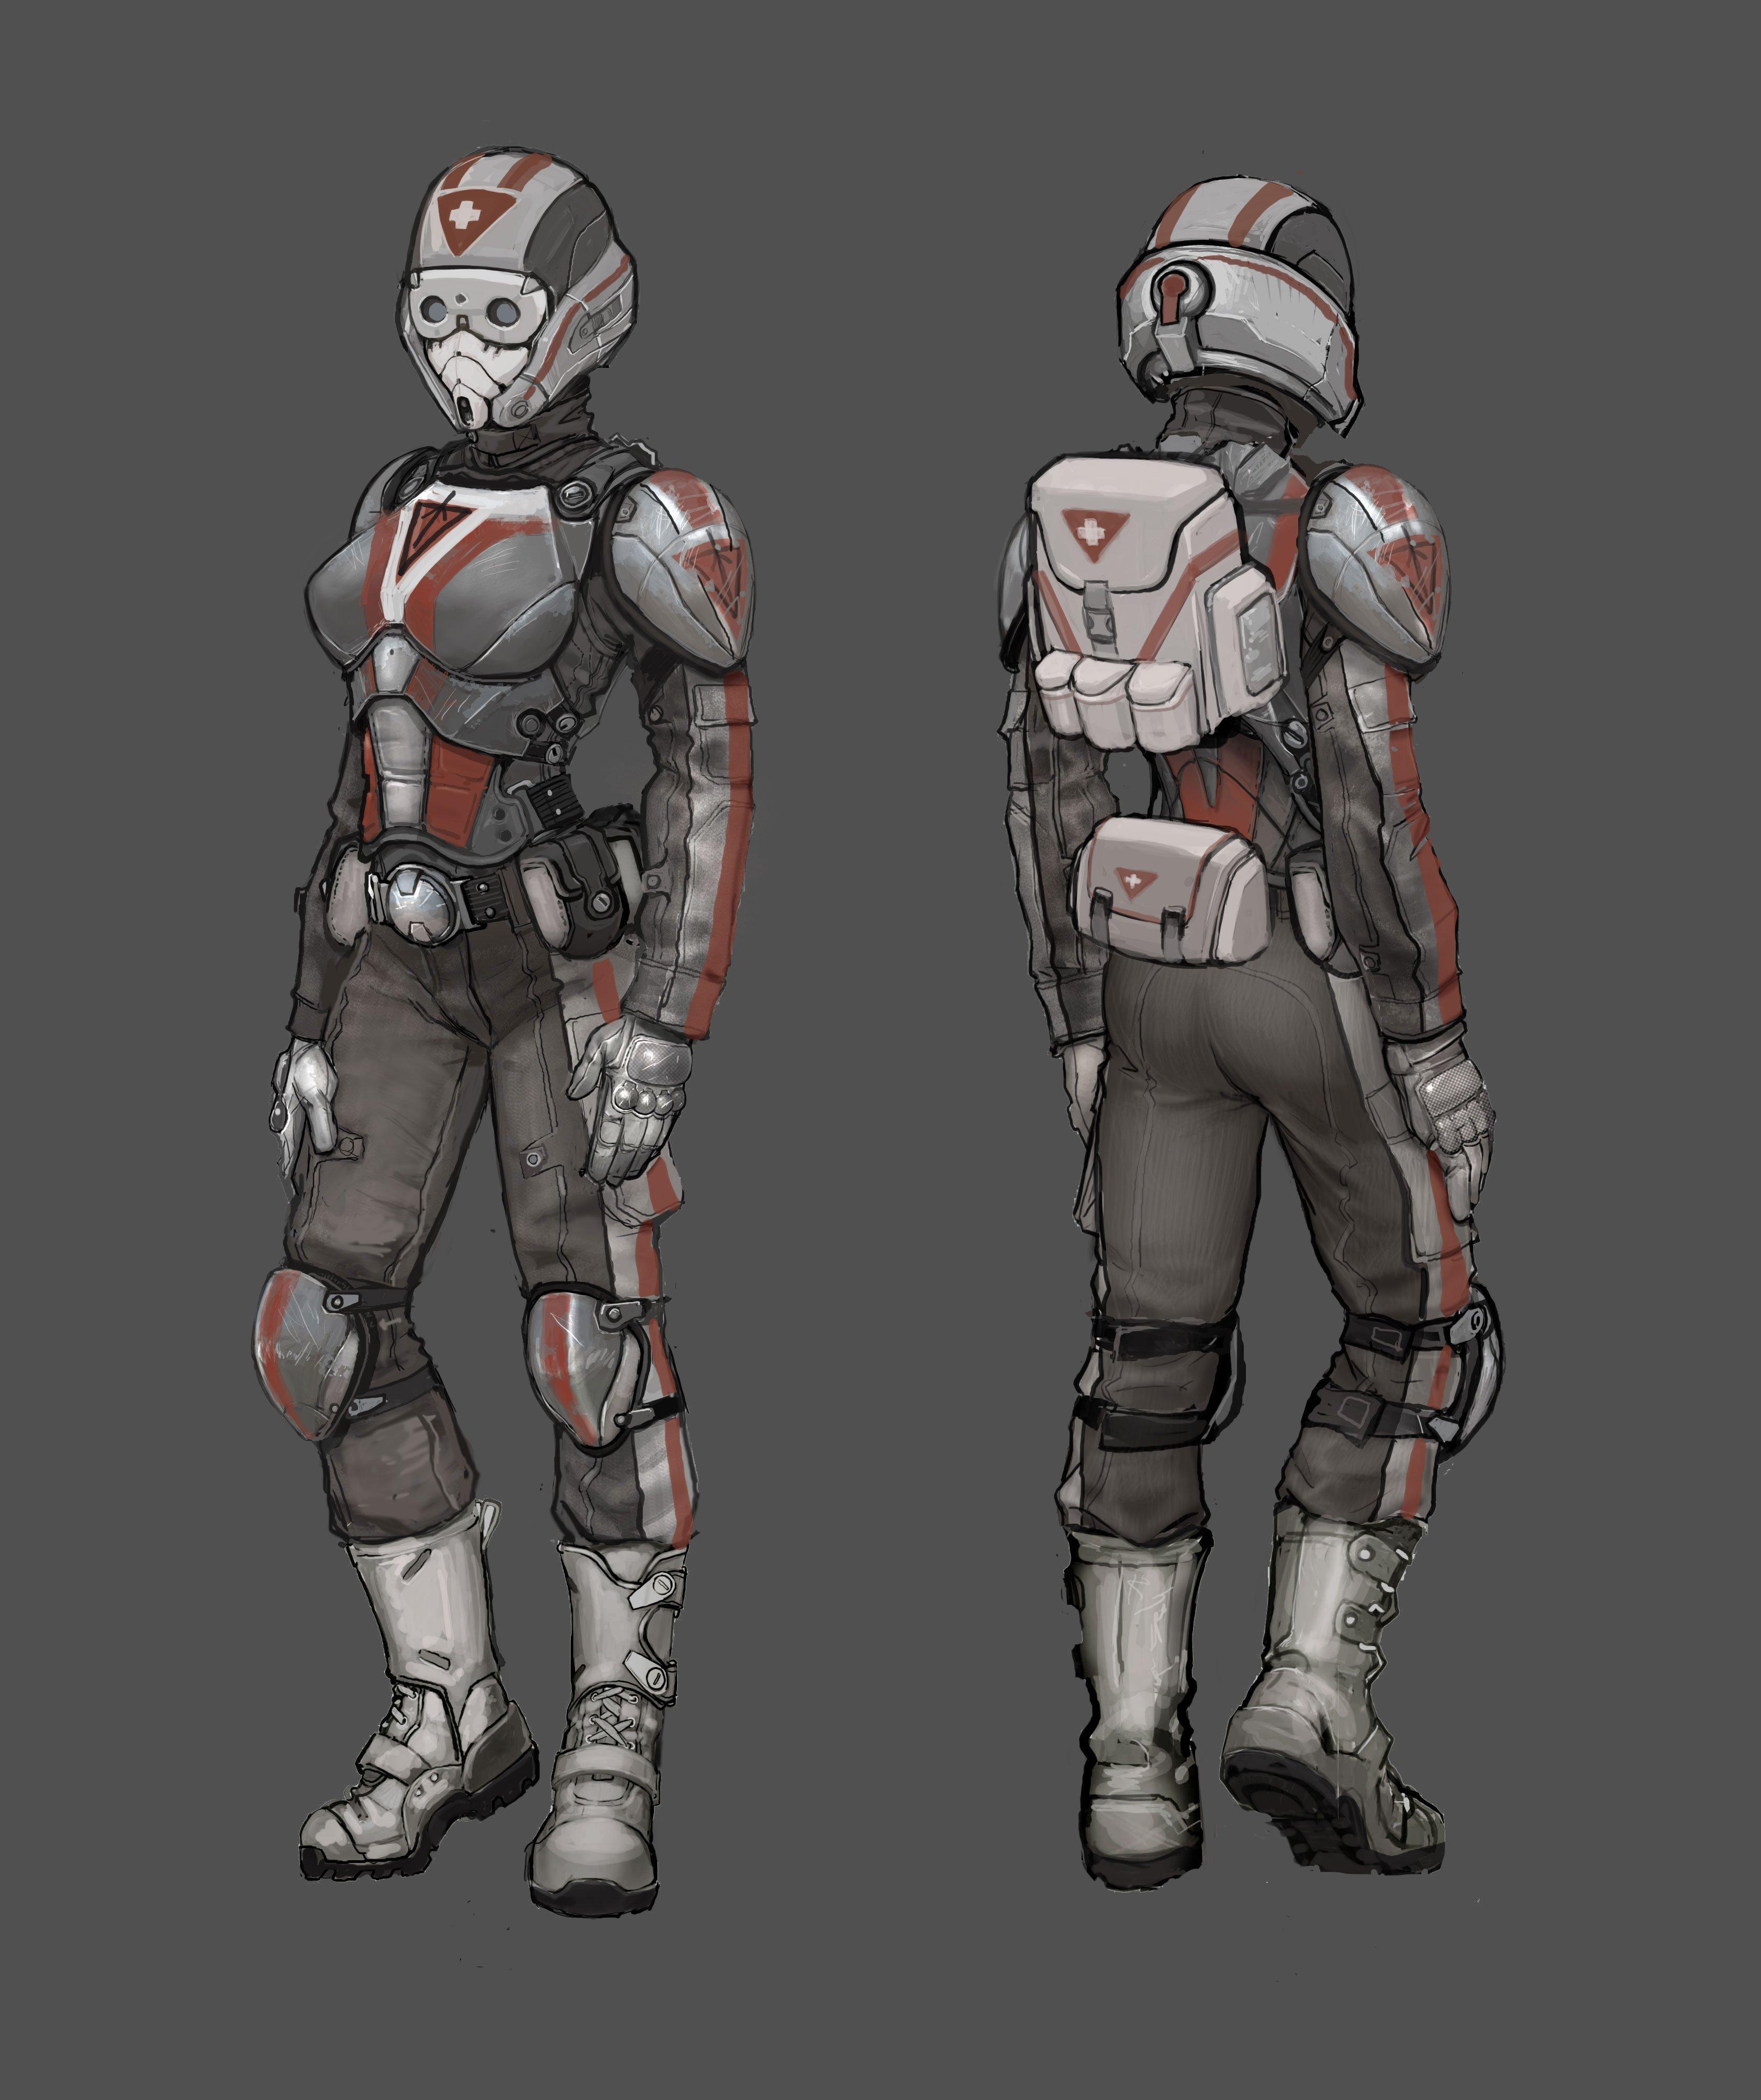 GamesCom 2011: PlanetSide 2 Screenshots Introduces New Character Classes #18761